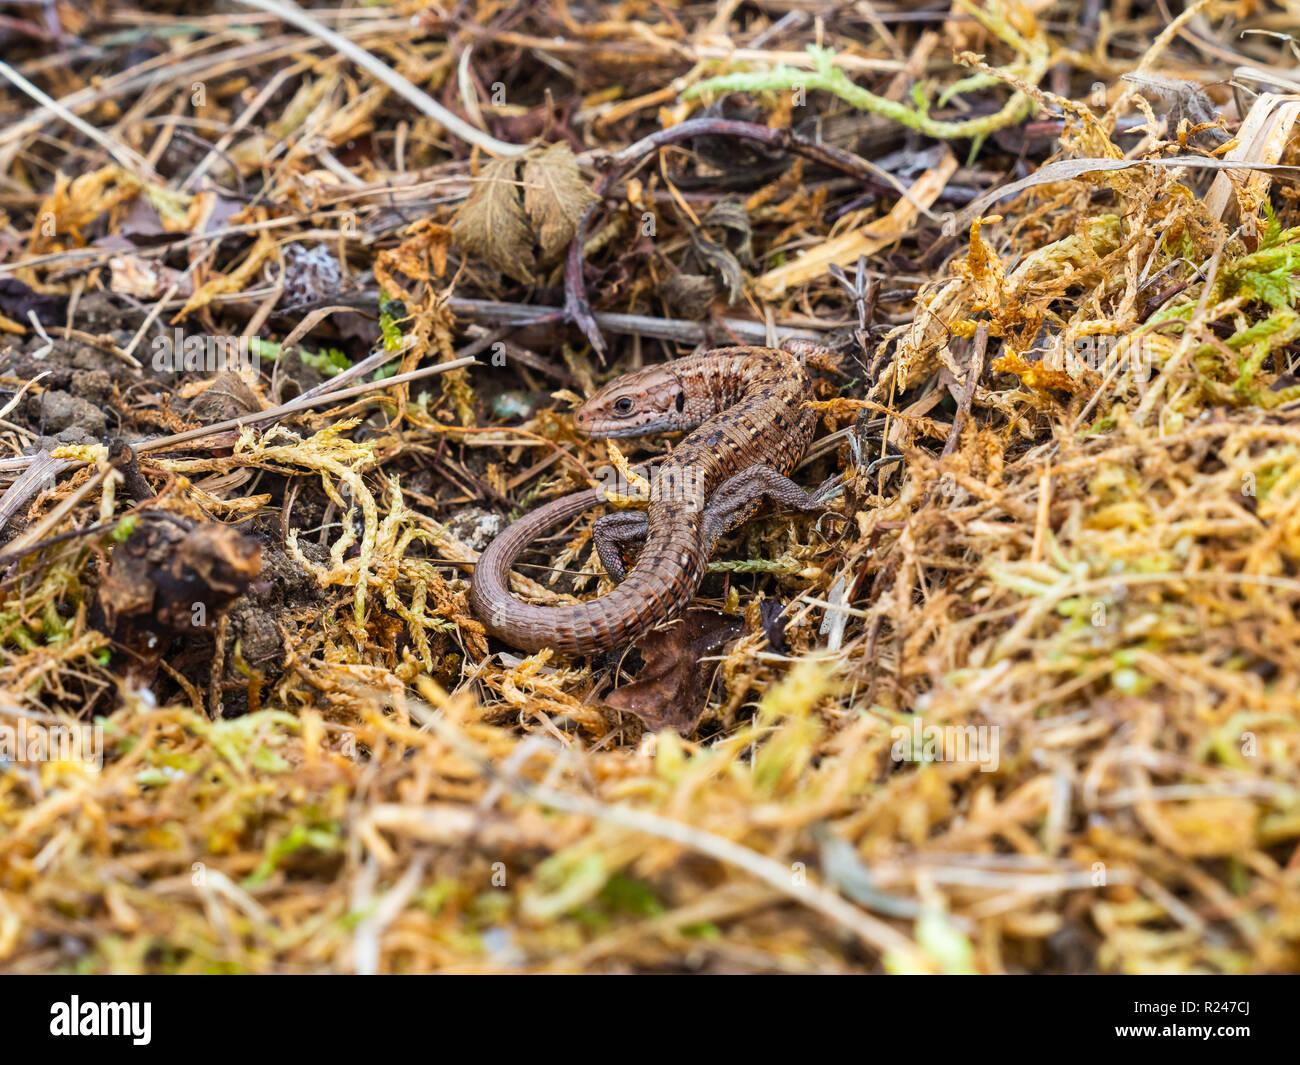 Common lizard (Lacerta Zootoca vivipara) basking - Stock Image